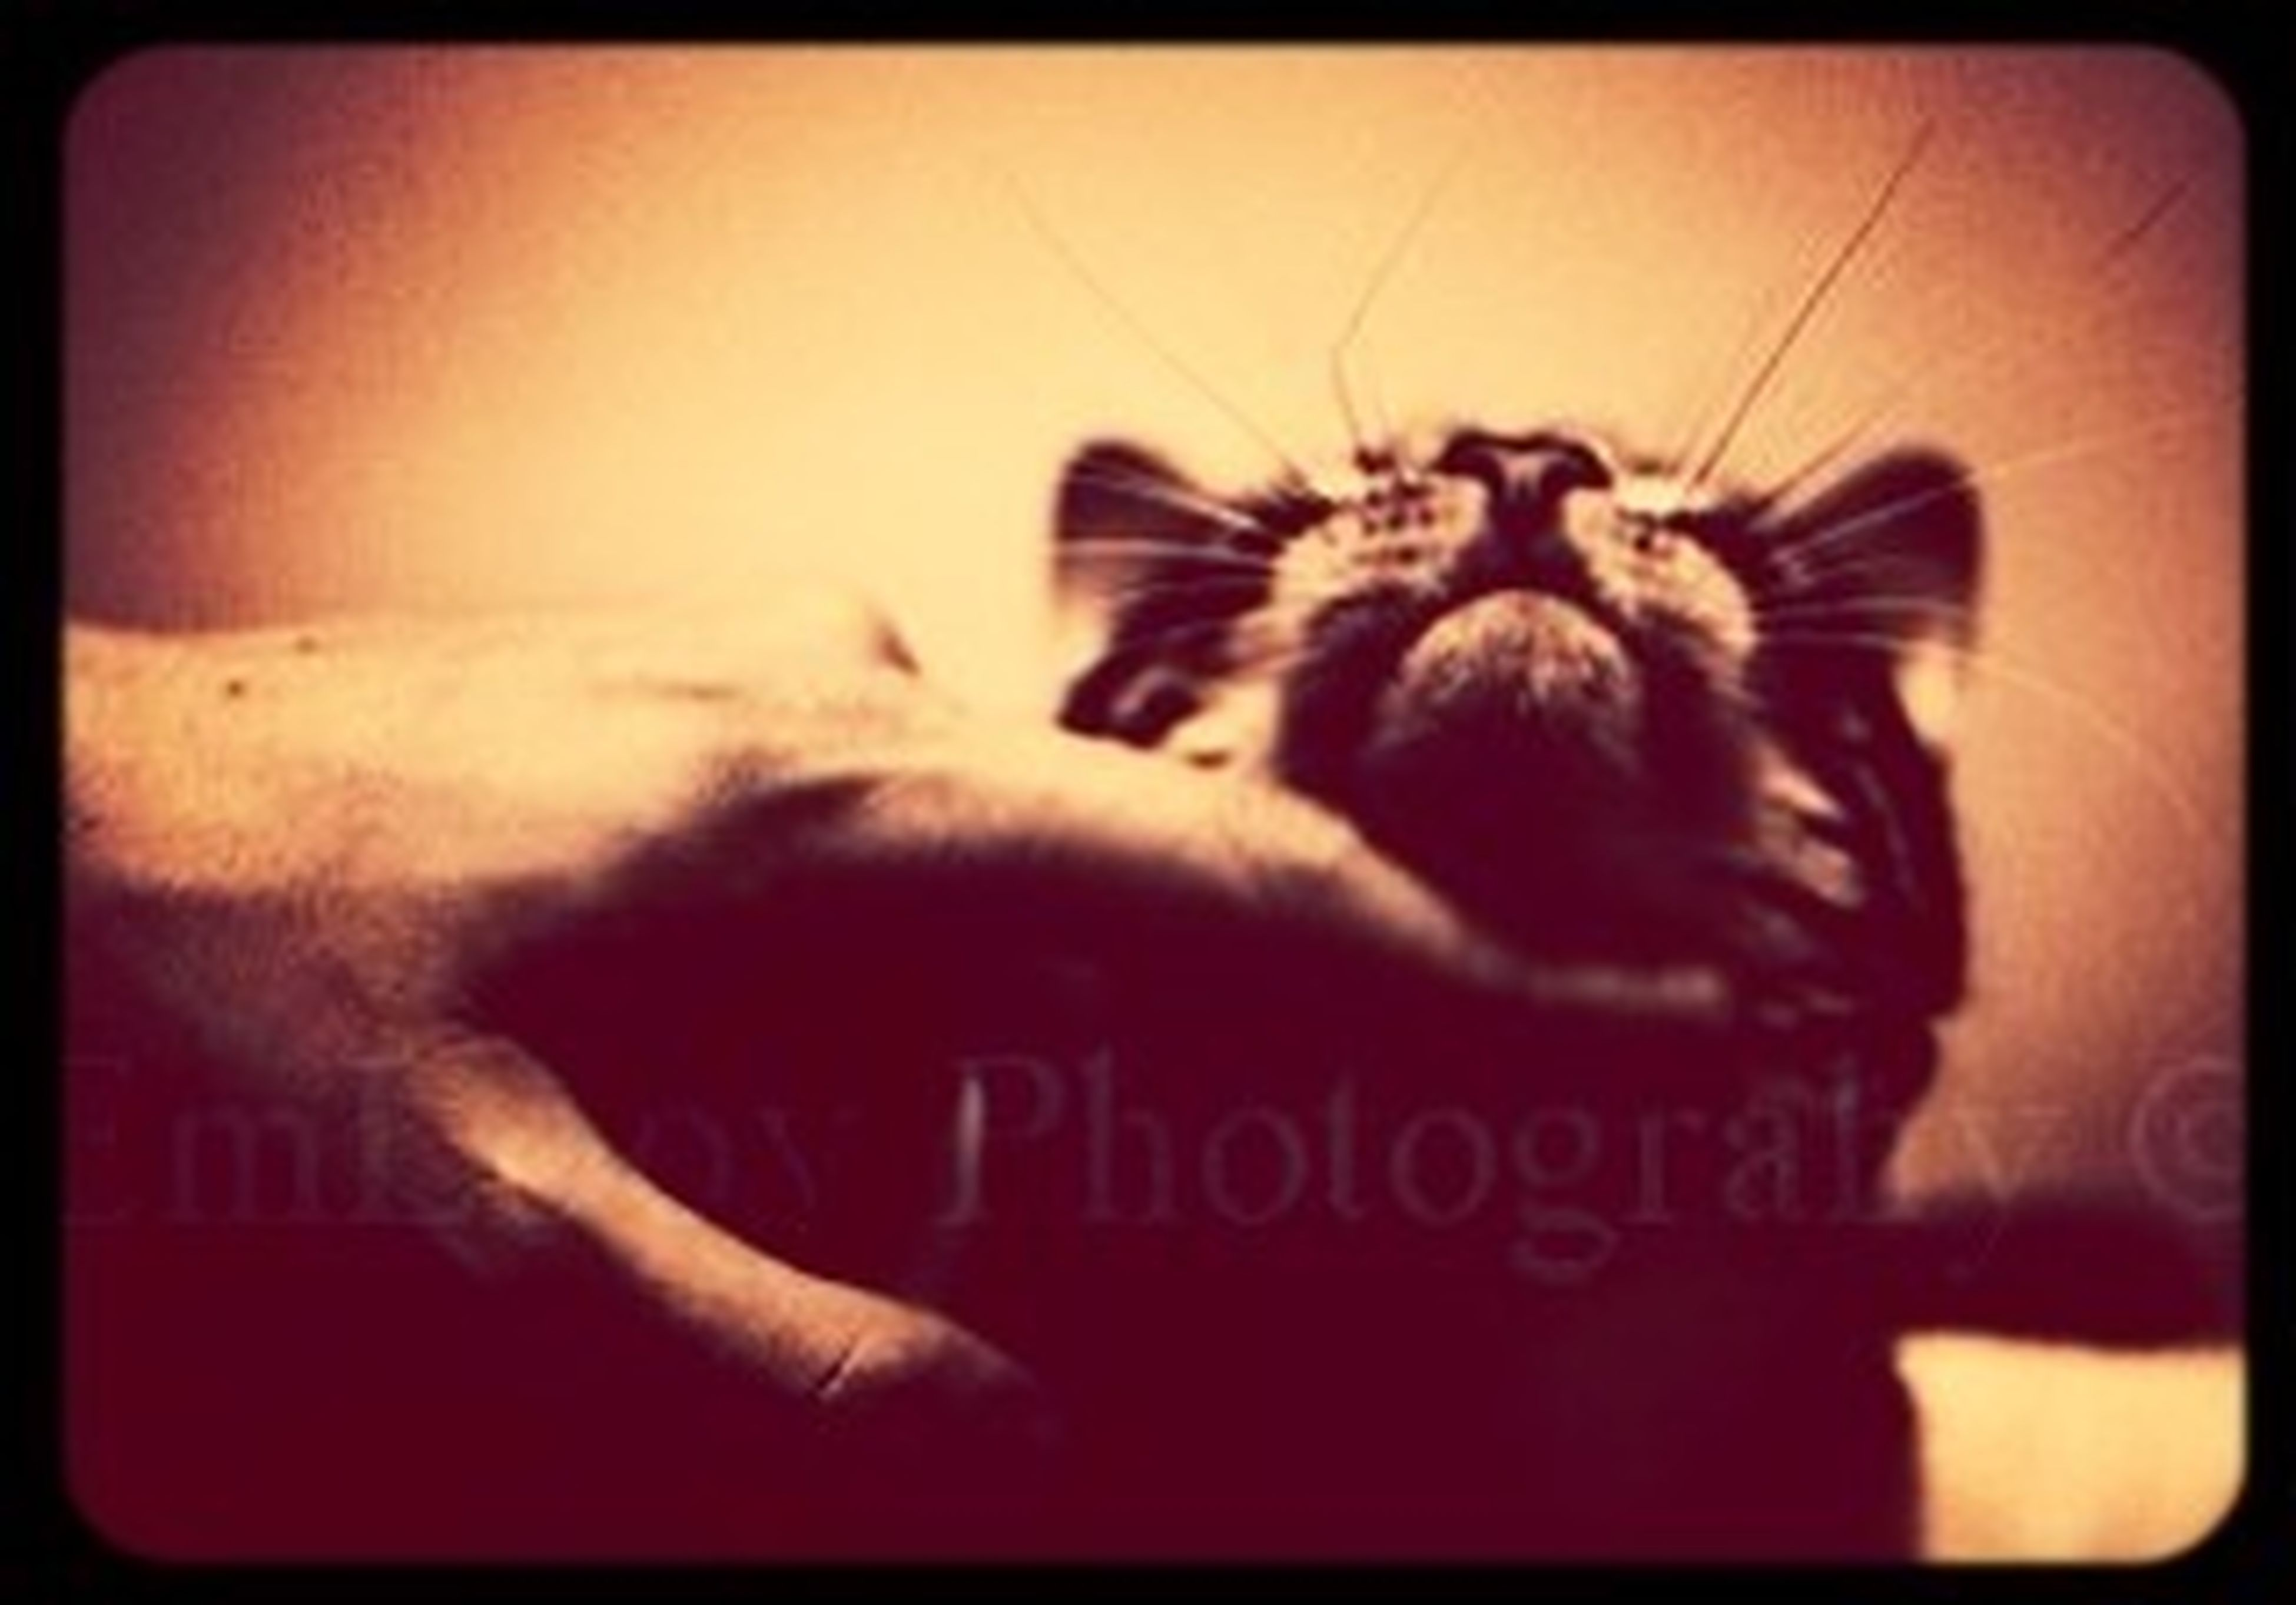 Pet Photoshoot #cat #whiskers #vintage #d7000